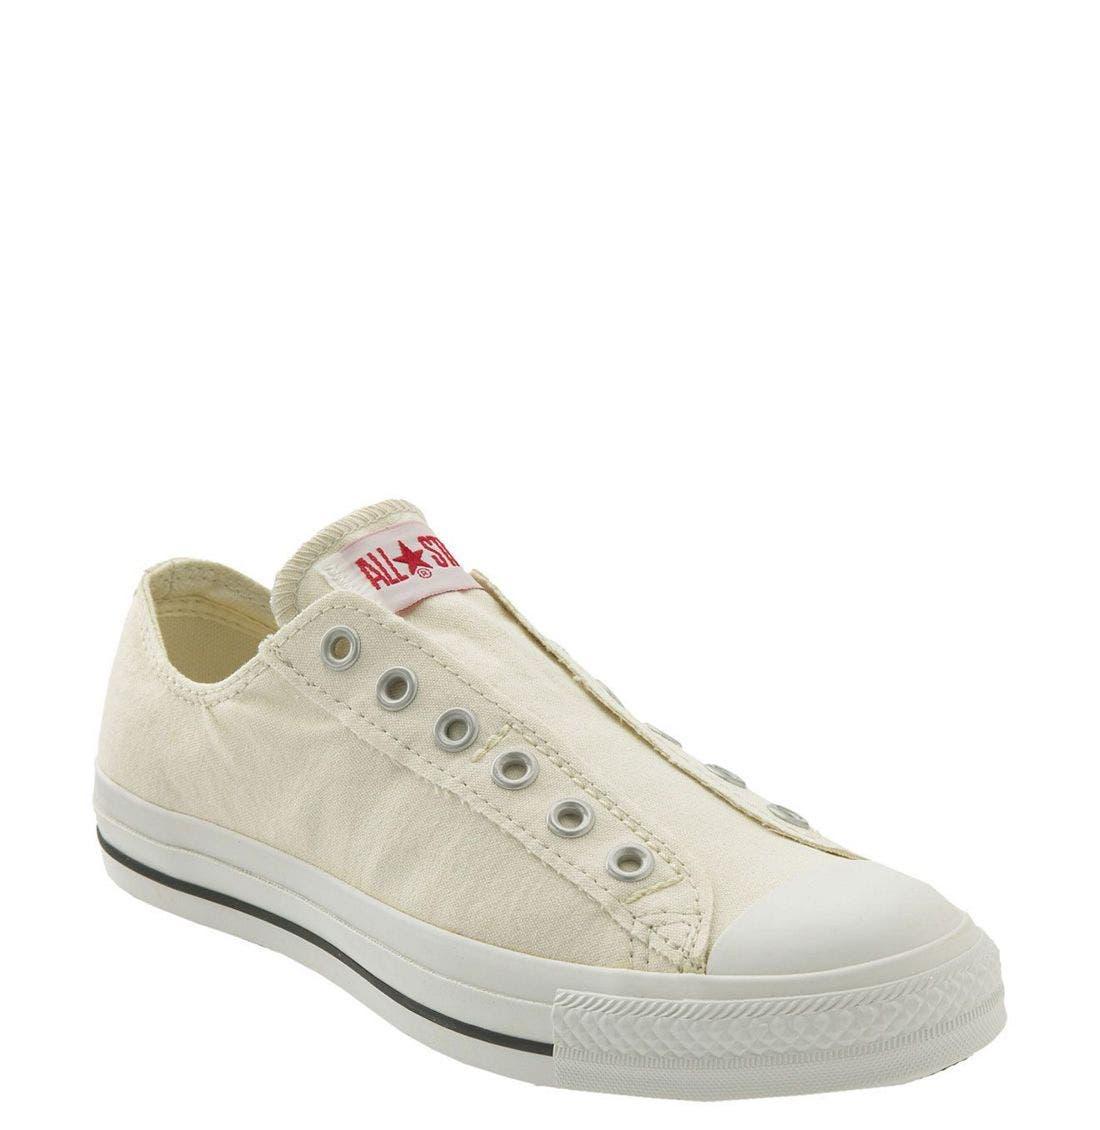 Main Image - Converse Chuck Taylor® Low Slip-On Sneaker (Women)